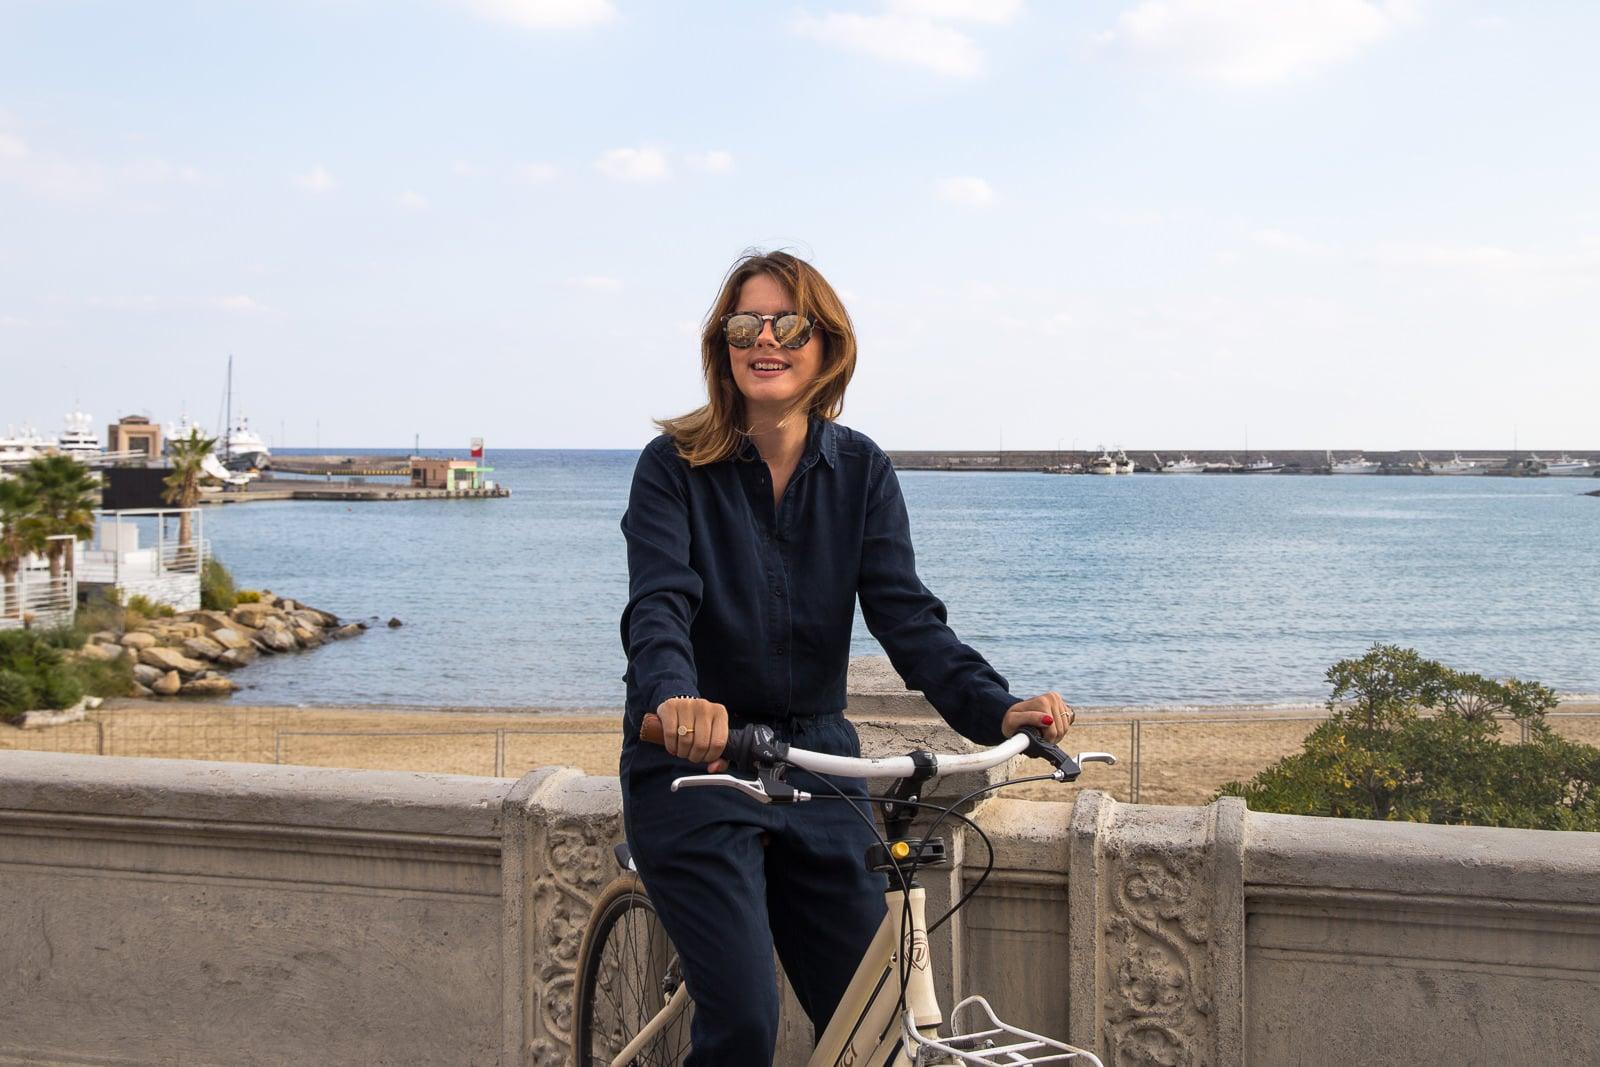 Italienische Riviera: Unterwegs mit Jumpsuit & Sneakers